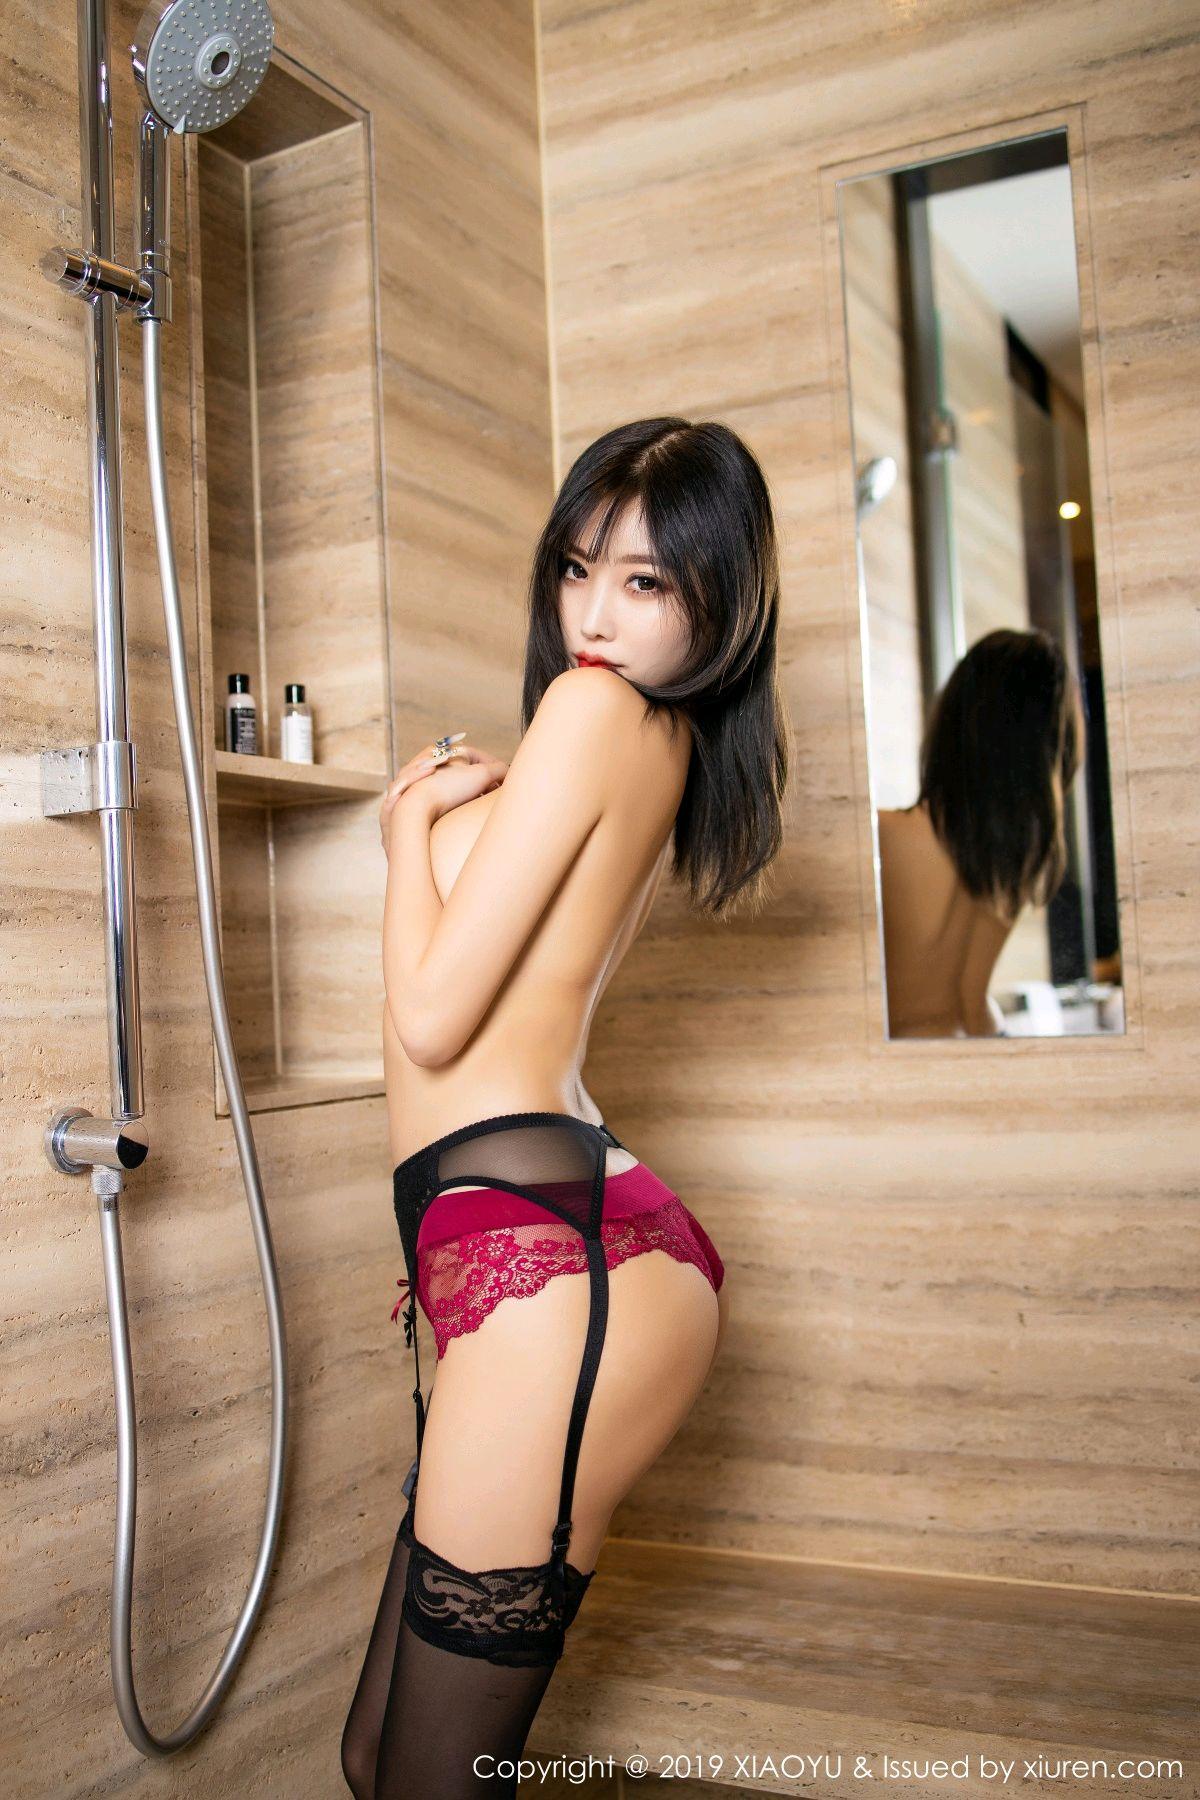 [XiaoYu] Vol.153 Yang Chen Chen 78P, Bathroom, Black Silk, Underwear, XiaoYu, Yang Chen Chen